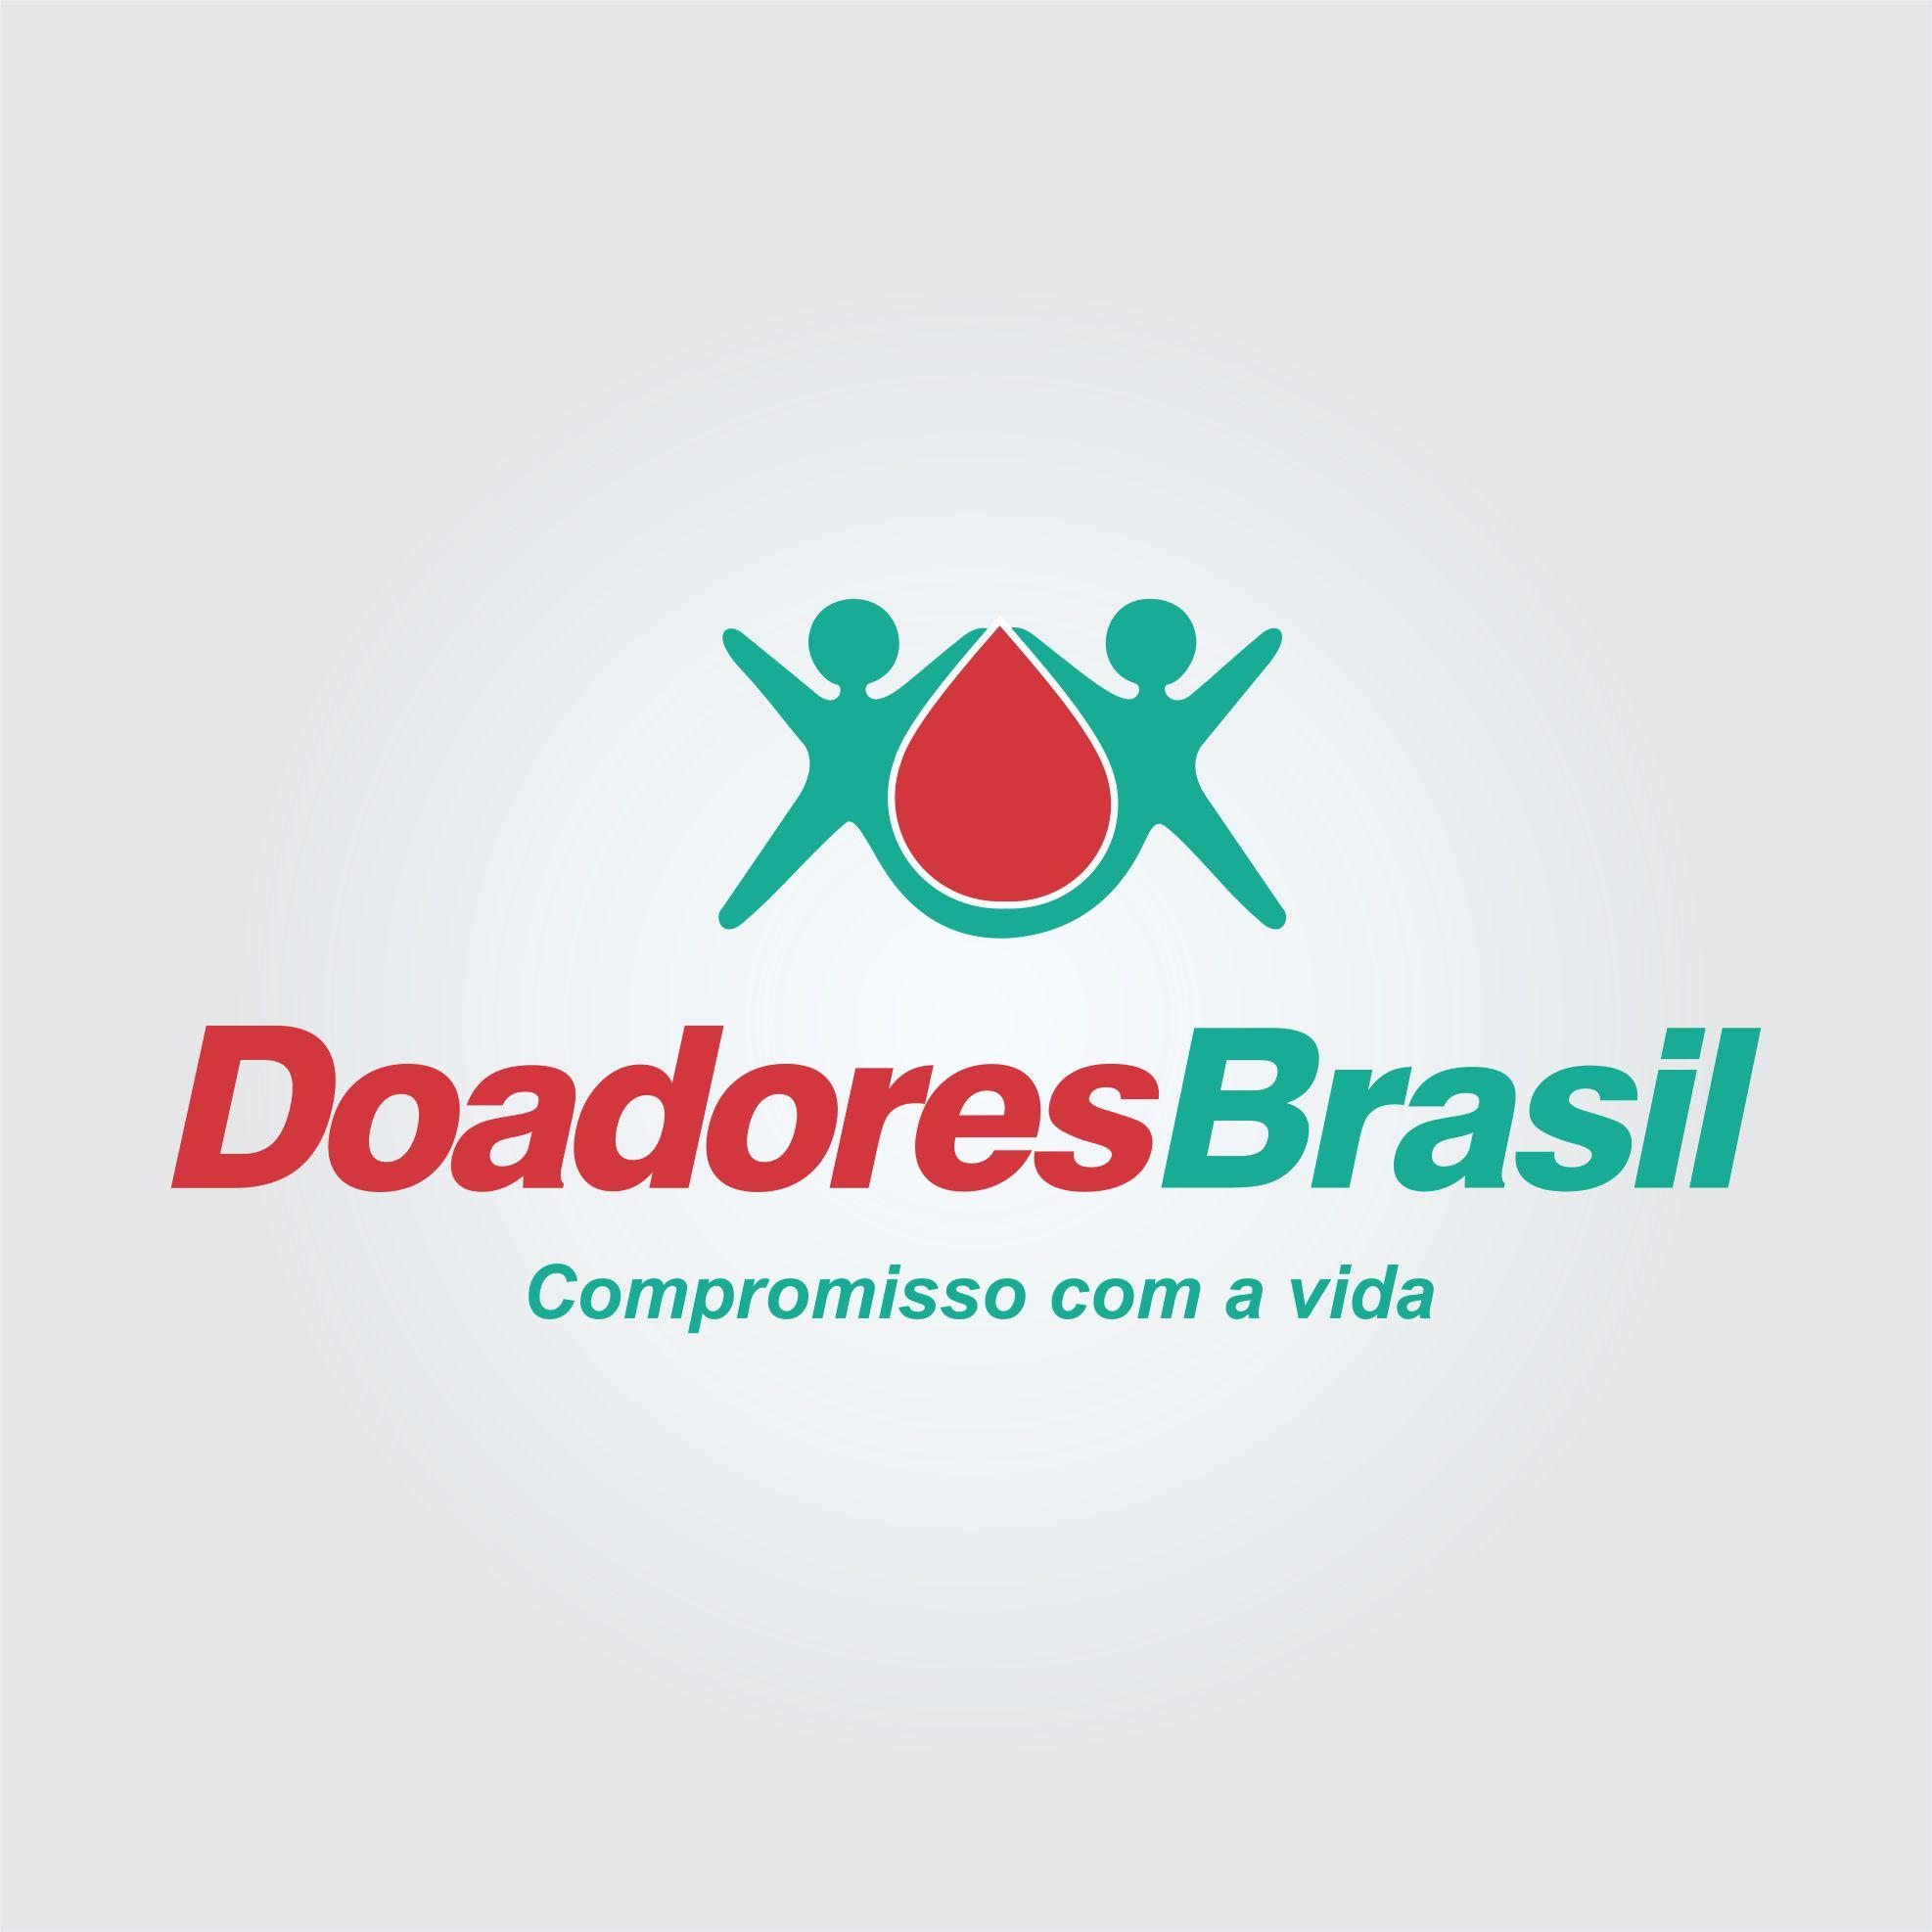 Doadores Brasil